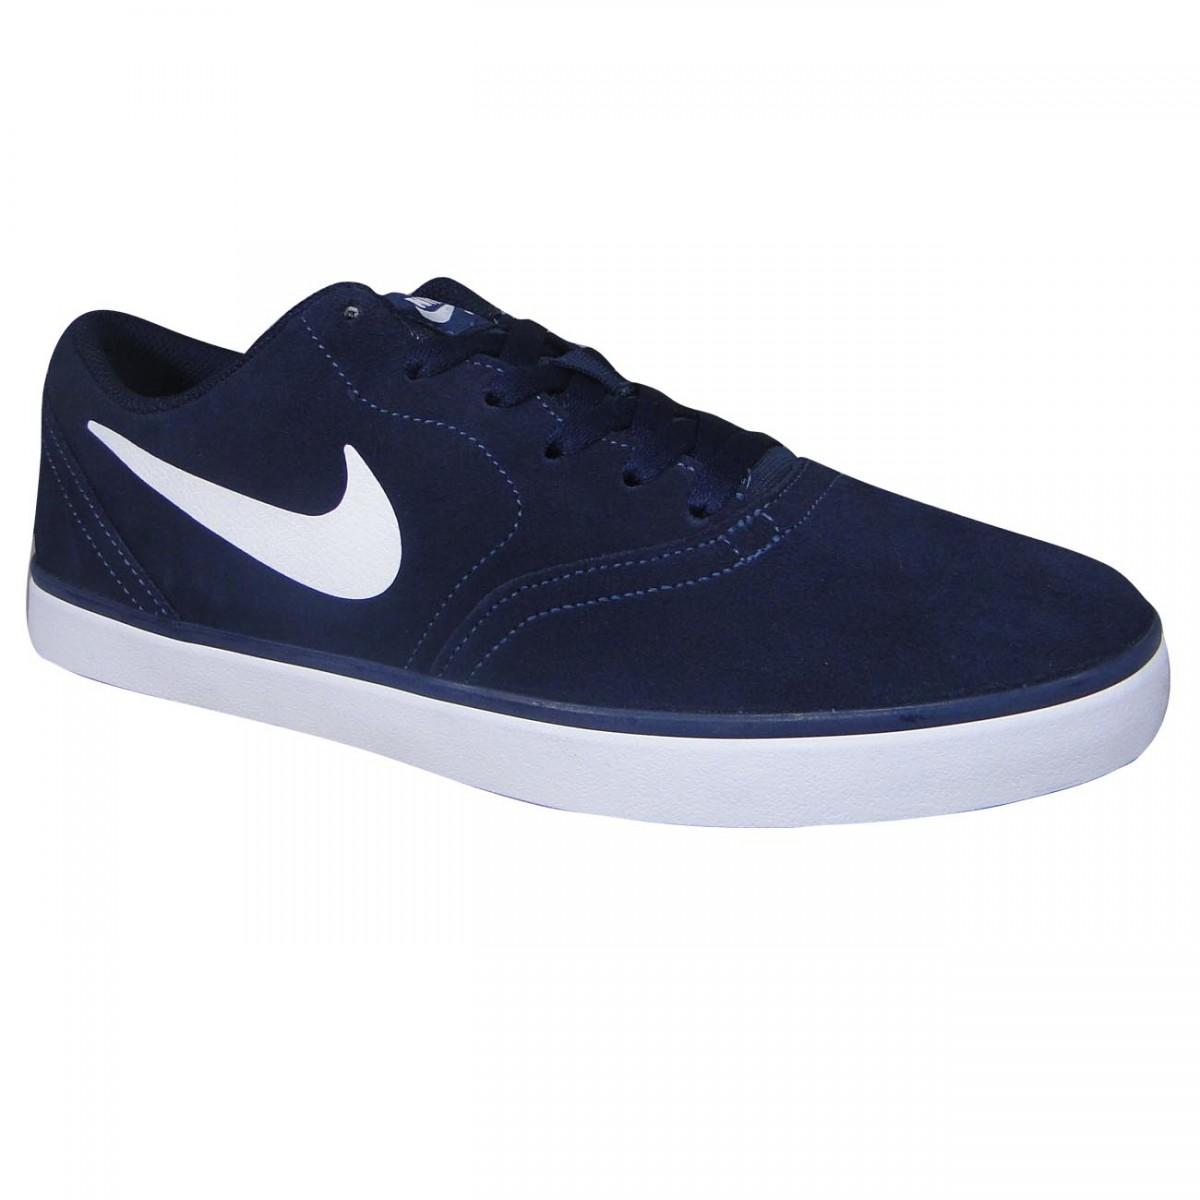 b983dc9827e Tenis Nike SB Check 705265 410 - Marinho Branco - Chuteira Nike ...